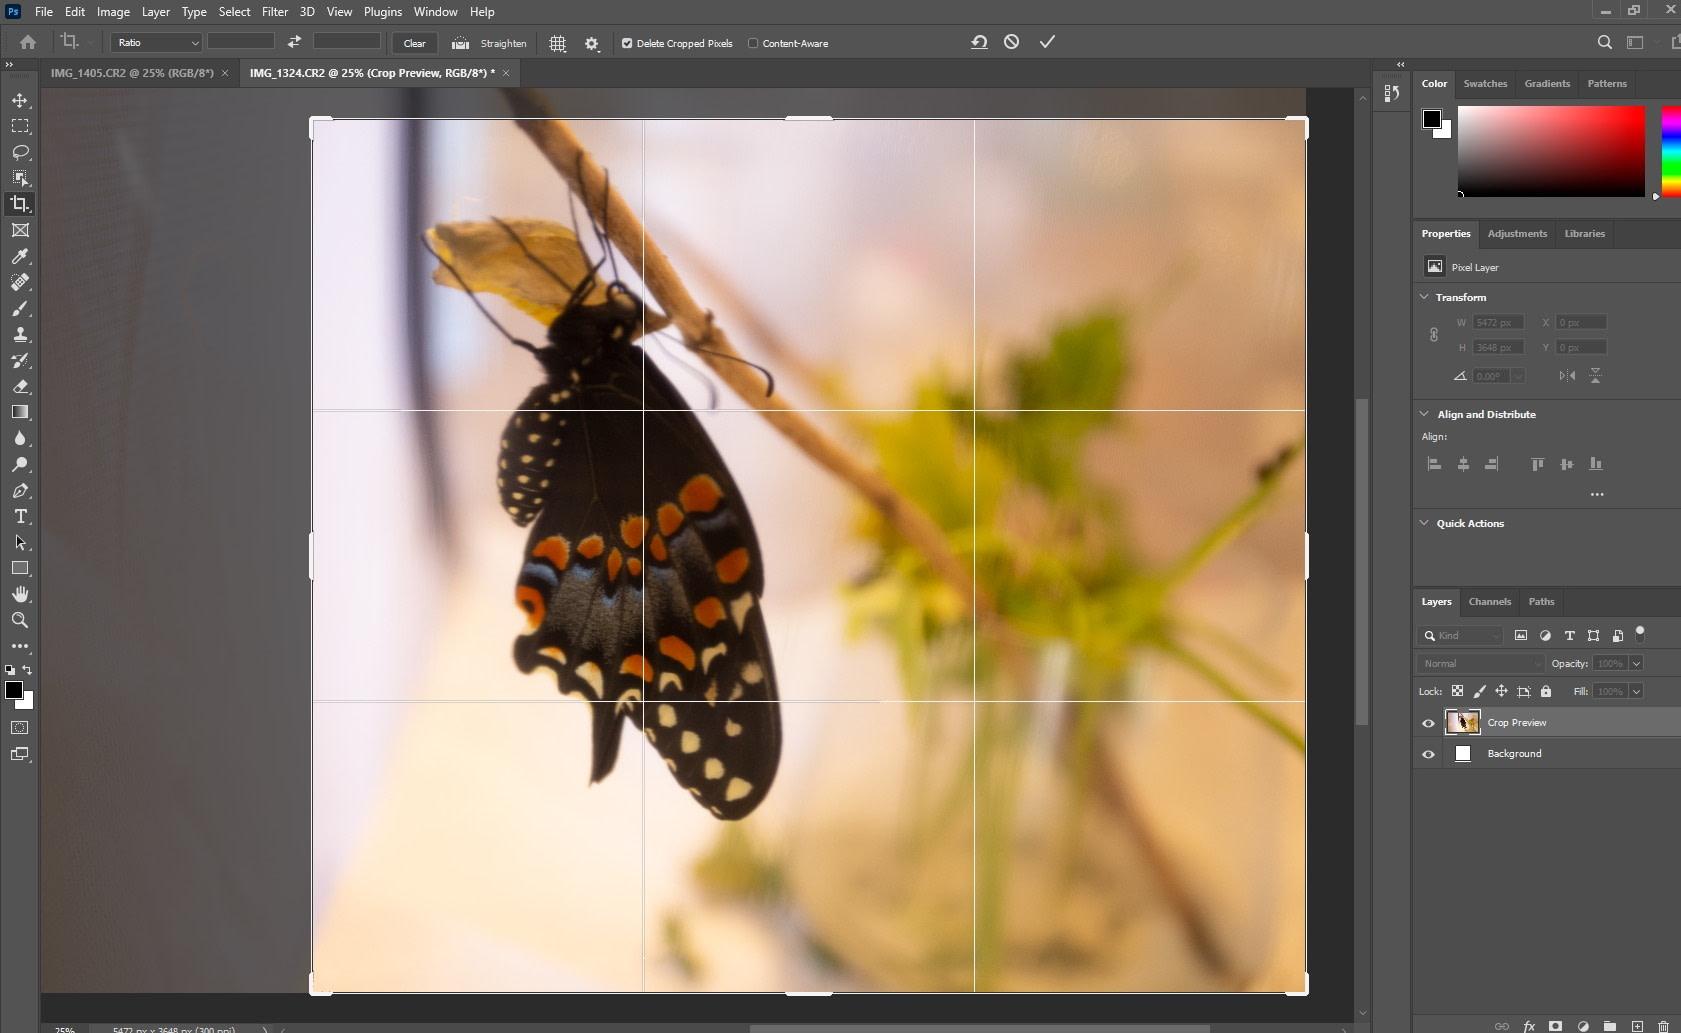 photo cropping in photoshop - Photoshop vs Illustrator vs InDesign